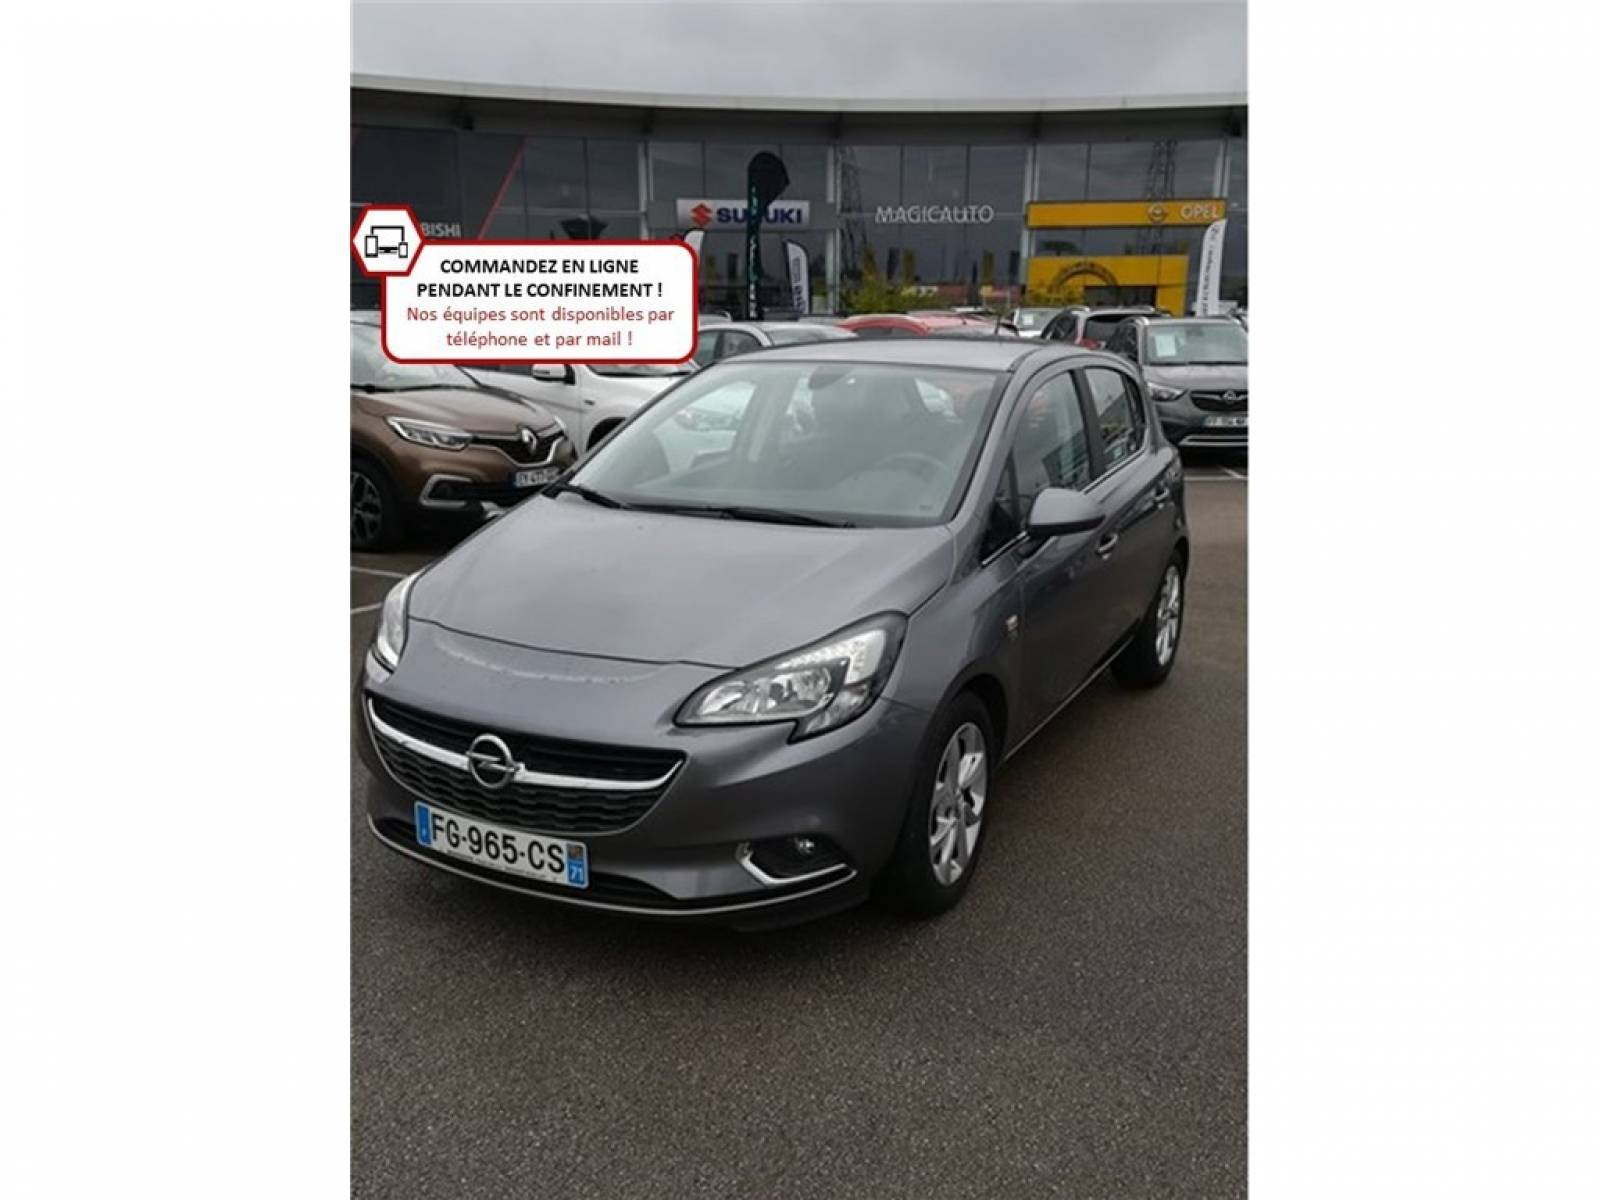 OPEL Corsa 1.4 Turbo 100 ch - véhicule d'occasion - Groupe Guillet - Opel Magicauto - Chalon-sur-Saône - 71380 - Saint-Marcel - 1